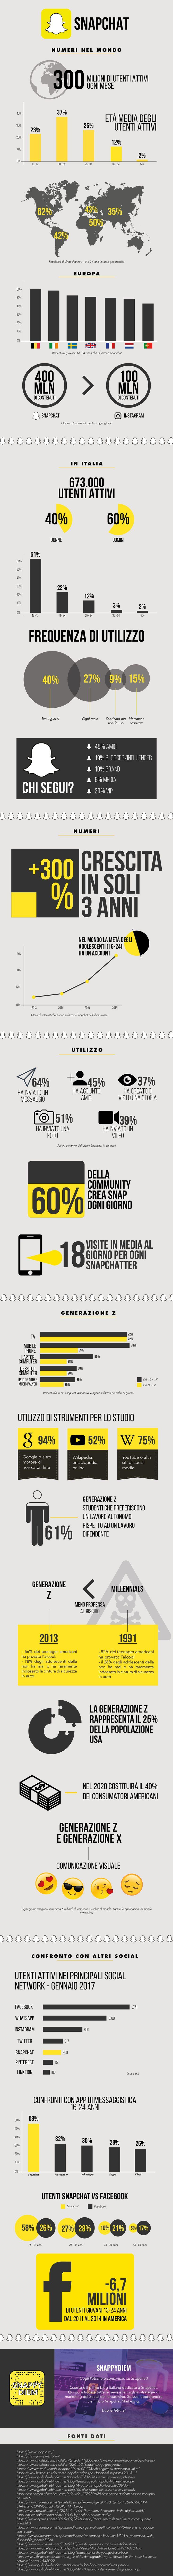 infografica #snapchat